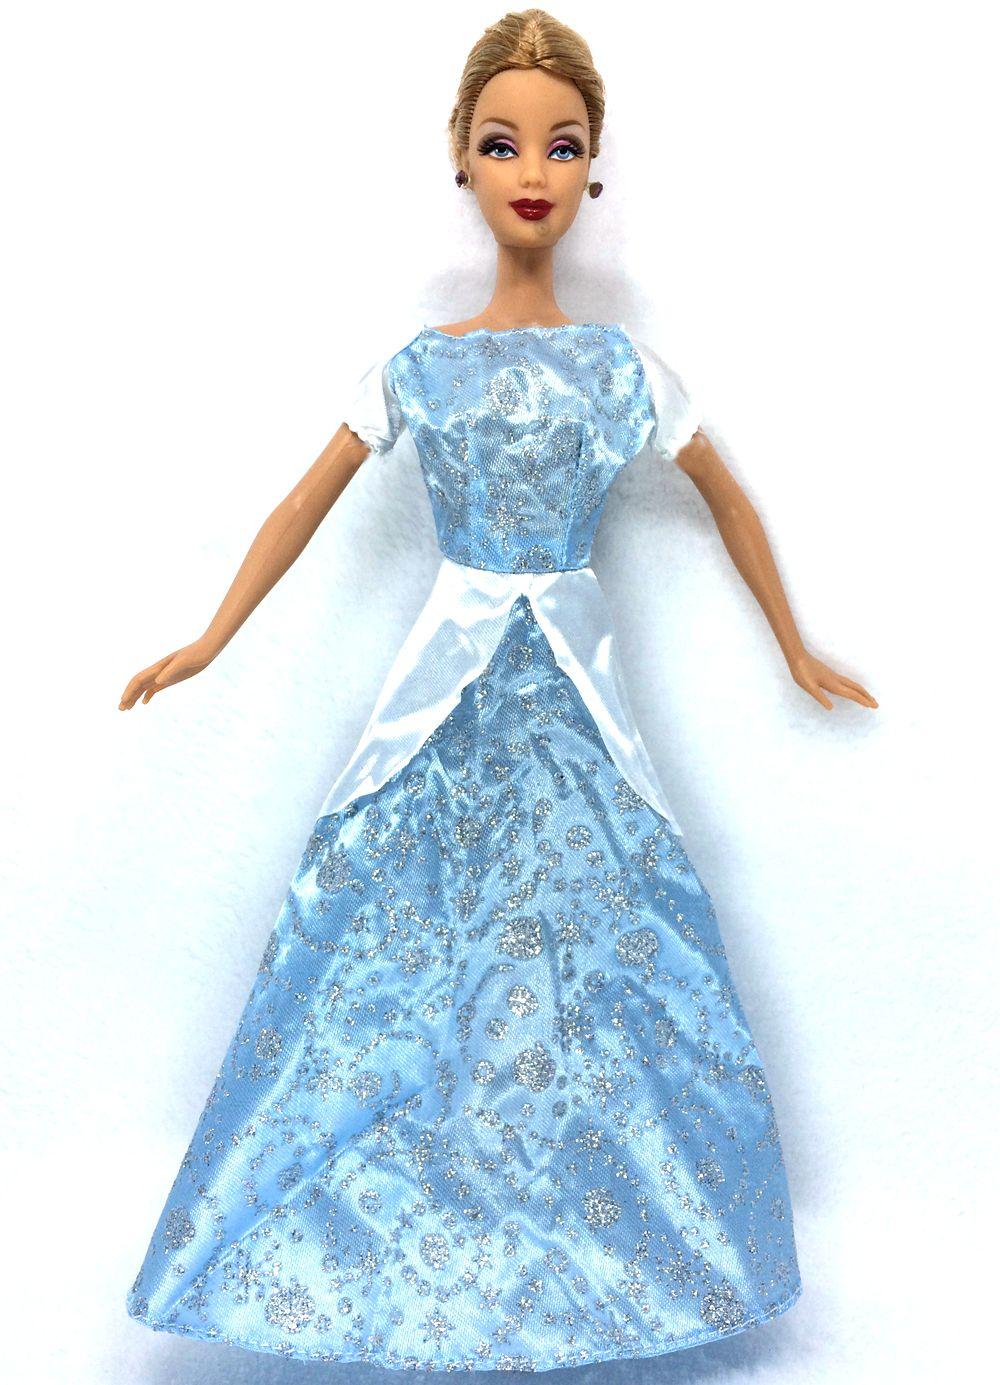 1950 cinderella princes wedding dress - Yahoo Search Results Yahoo ...